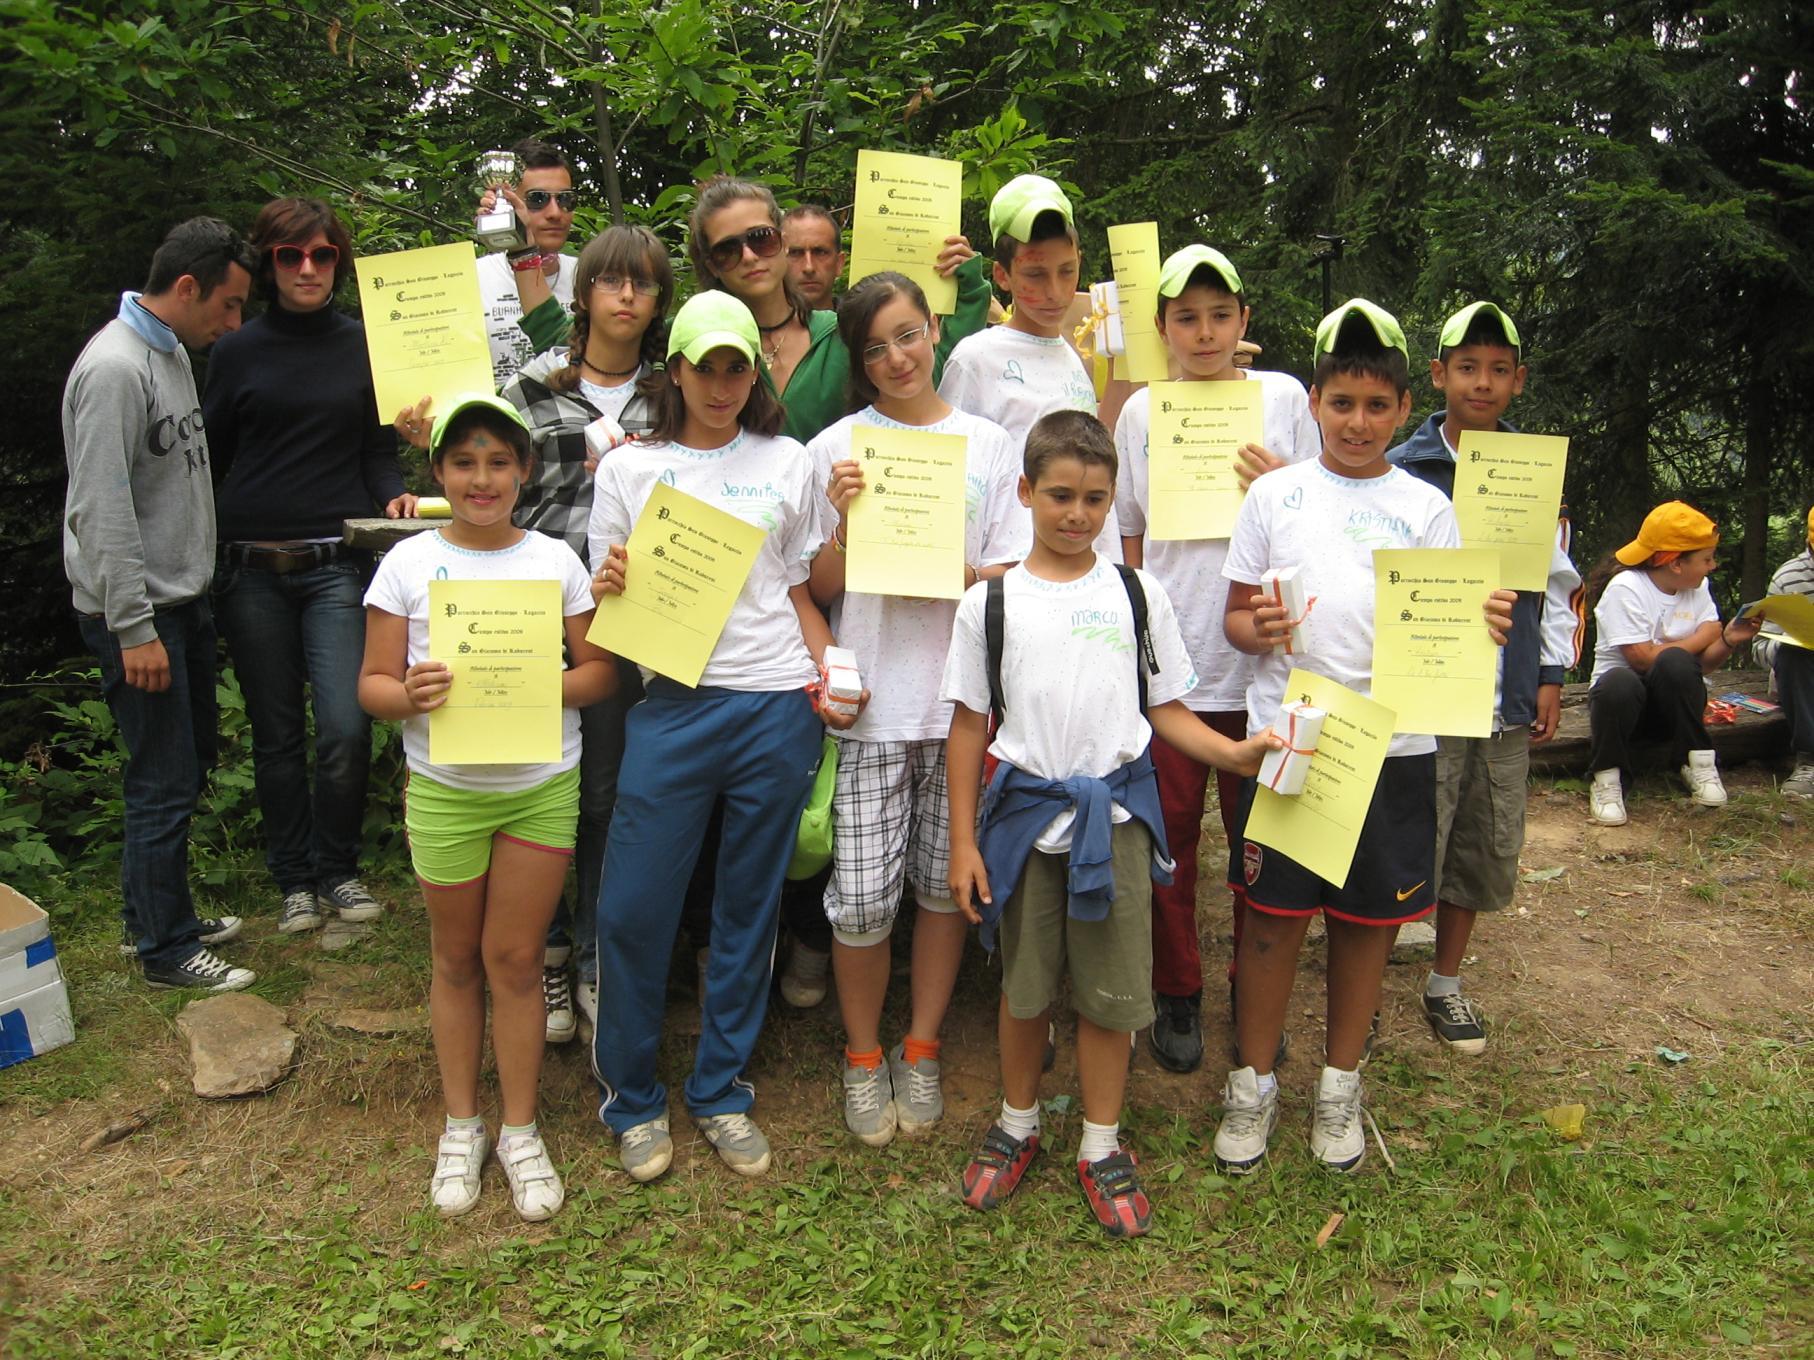 Campo_San_Giacomo_squadre-2009-07-12--12.28.38